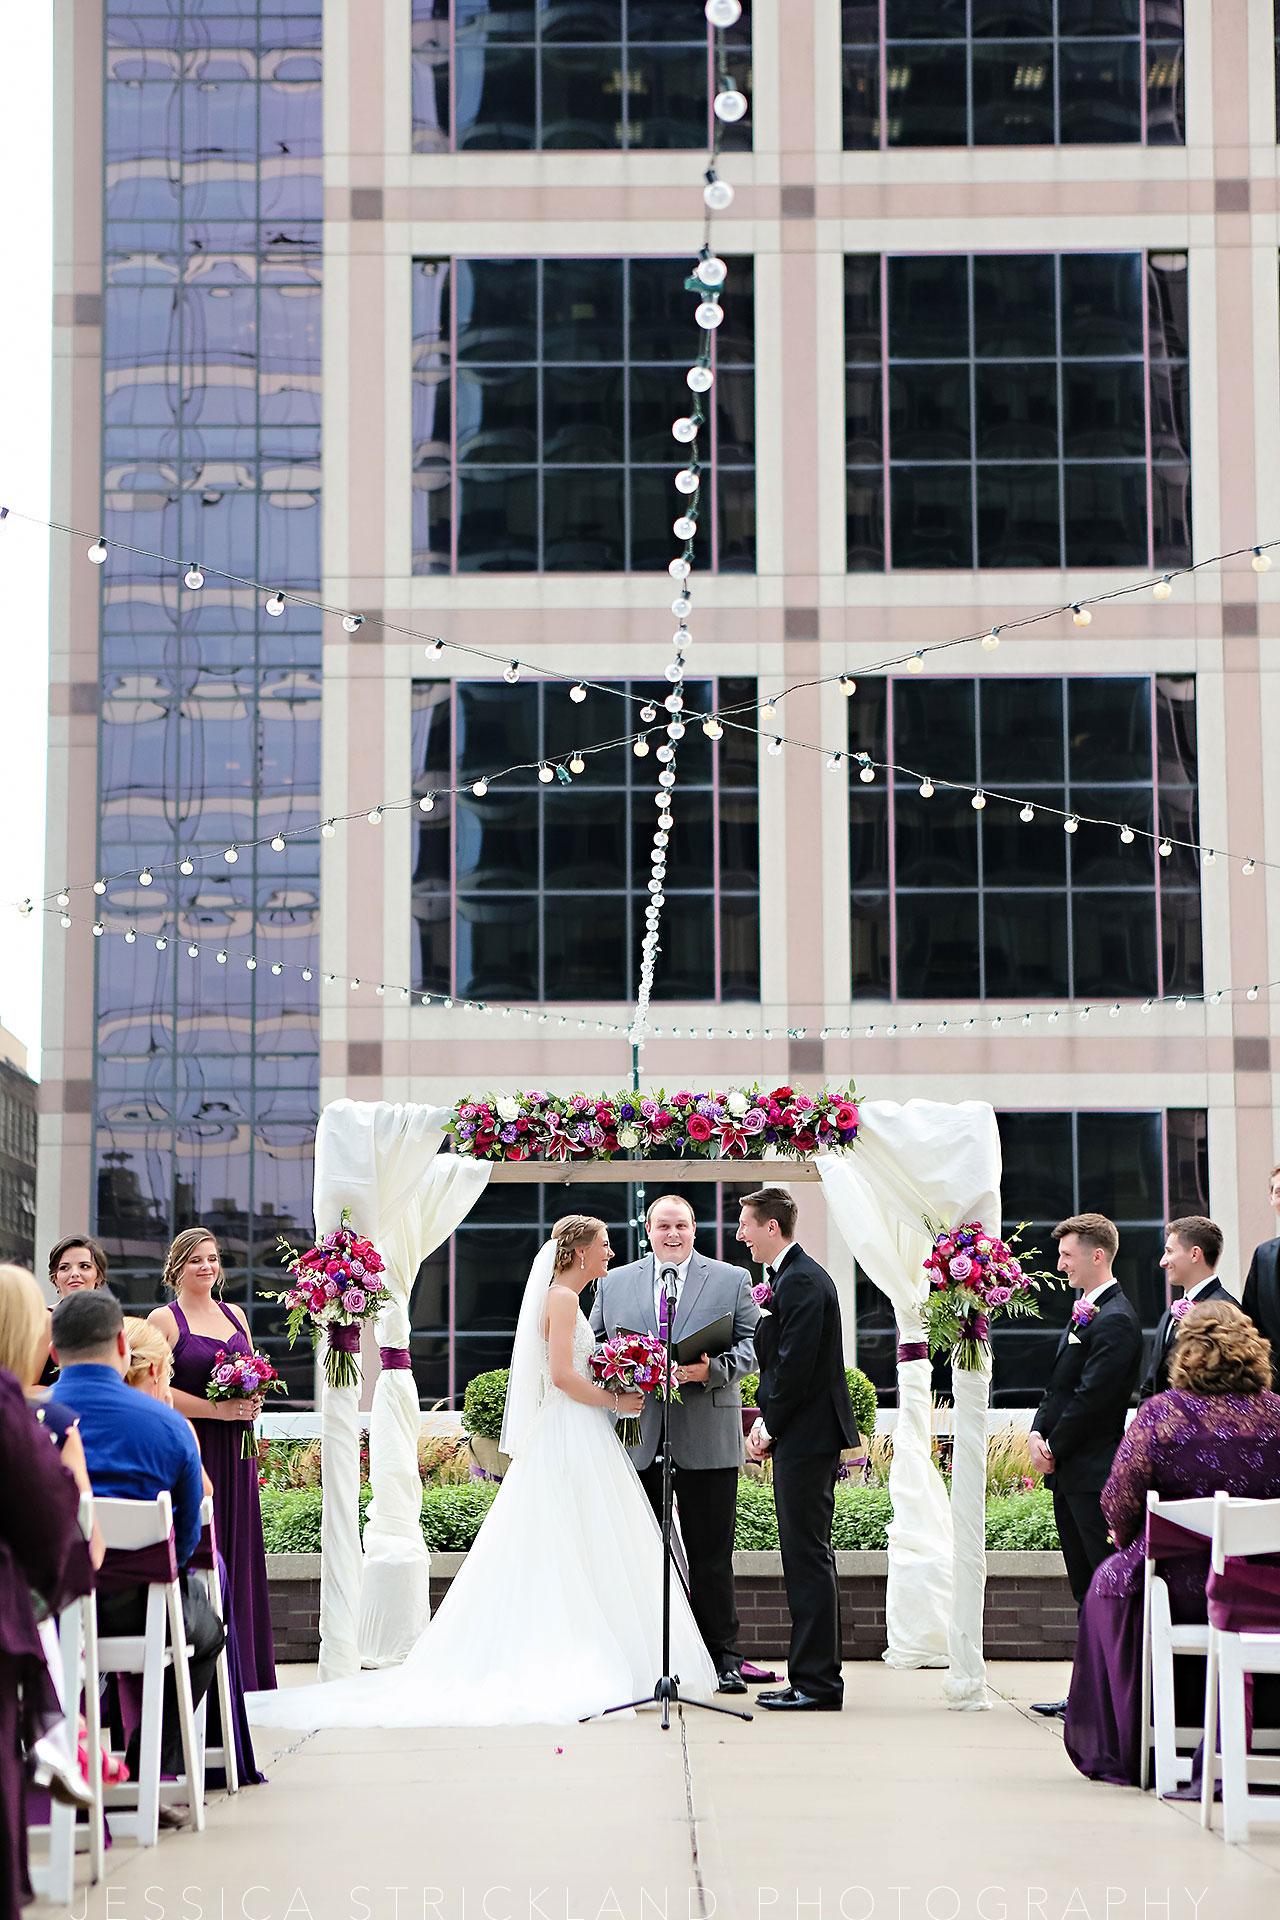 Serra Alex Regions Tower Indianapolis Wedding 162 watermarked